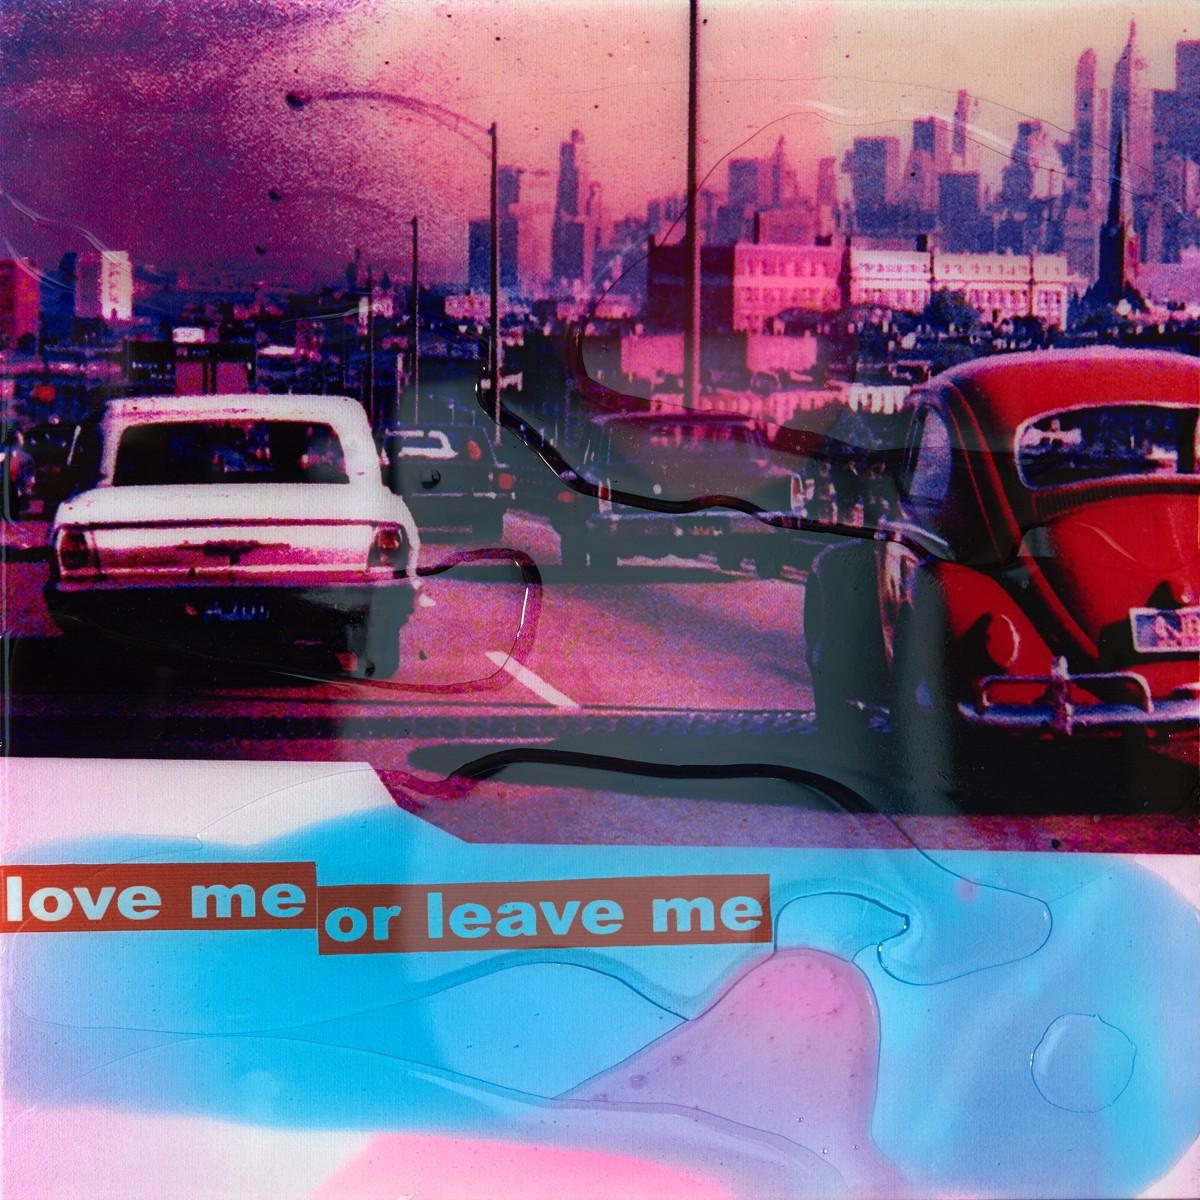 Love me or leave me - Döring, Jörg - k-DLOME29